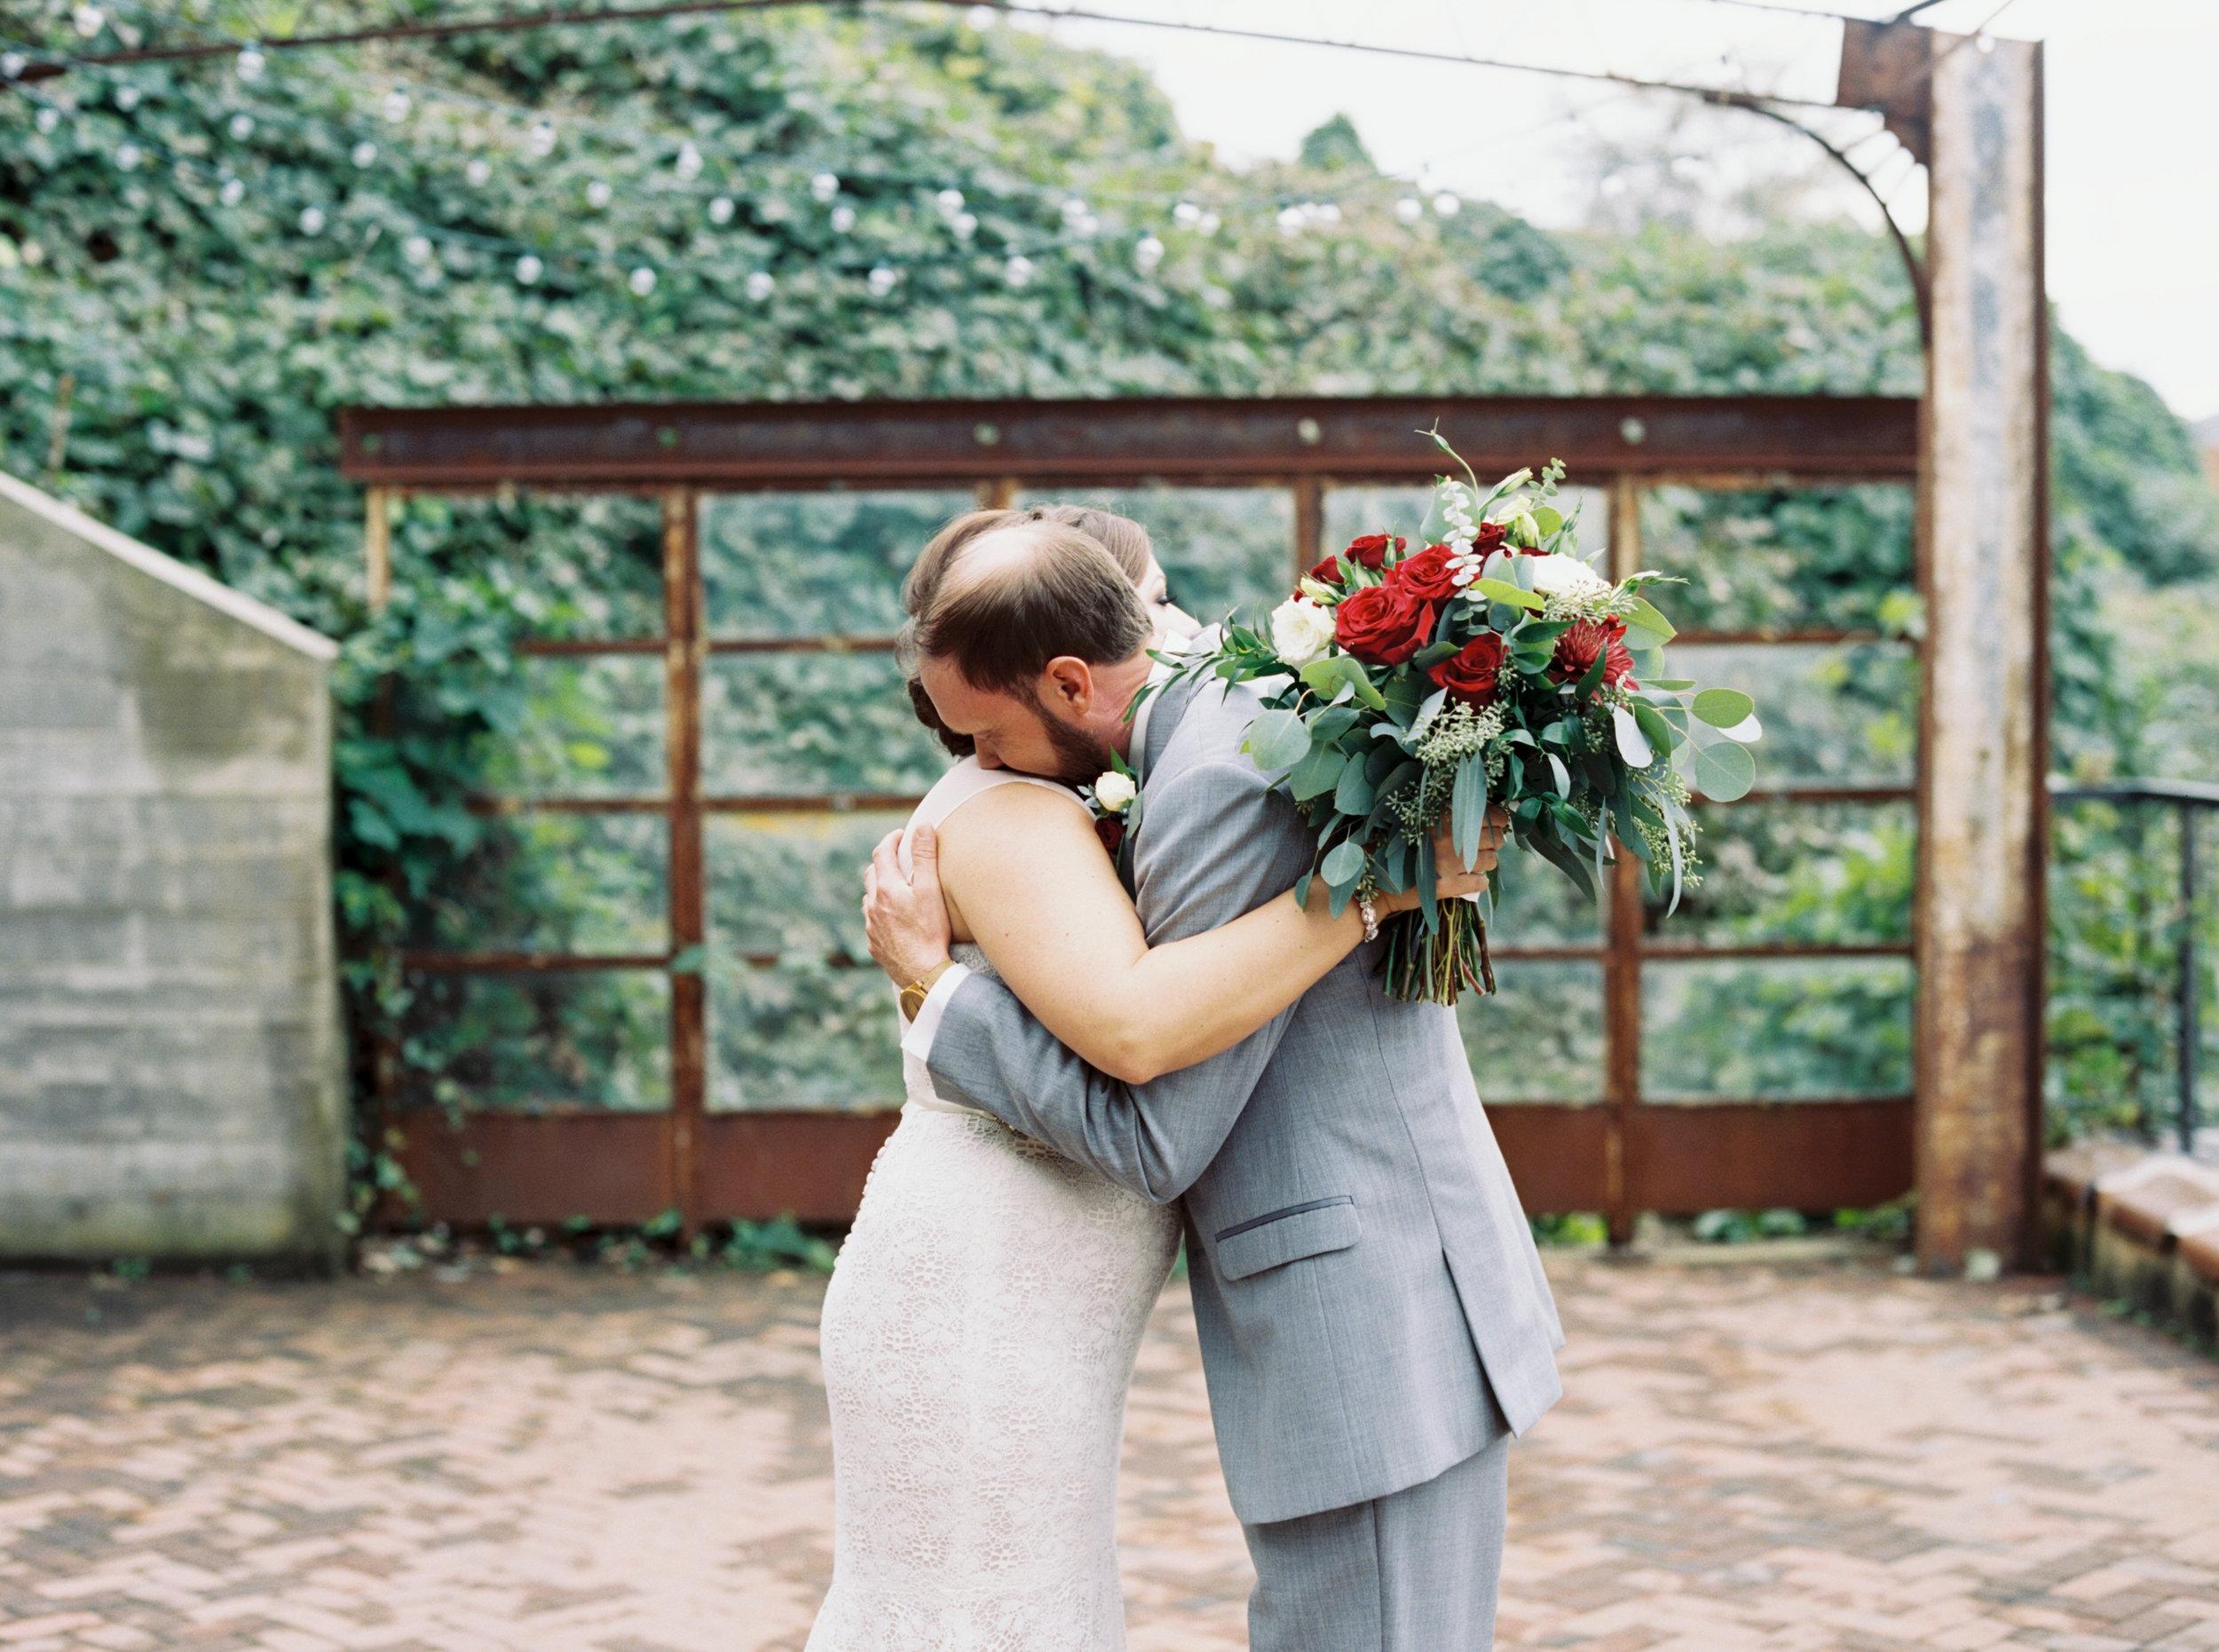 Jessica_Bryan_Wedding_Standard_Knoxville_Abigail_Malone_Photography-180.jpg